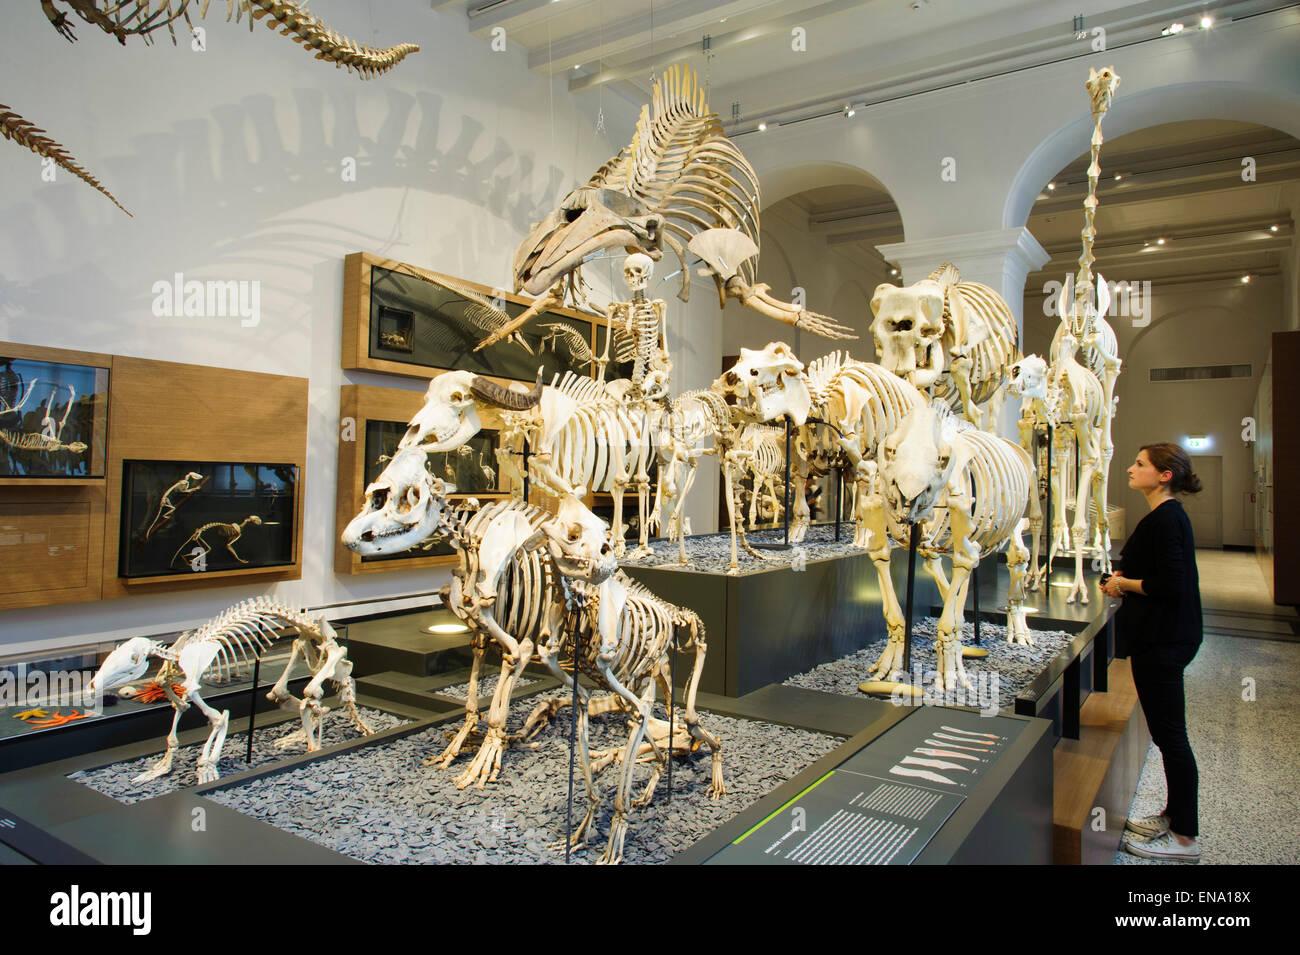 Hessisches Landesmuseum Darmstadt, Abteilung Zoologie, Darmstadt, Hessen, Deutschland | Museum Darmstadt, Hesse, - Stock Image